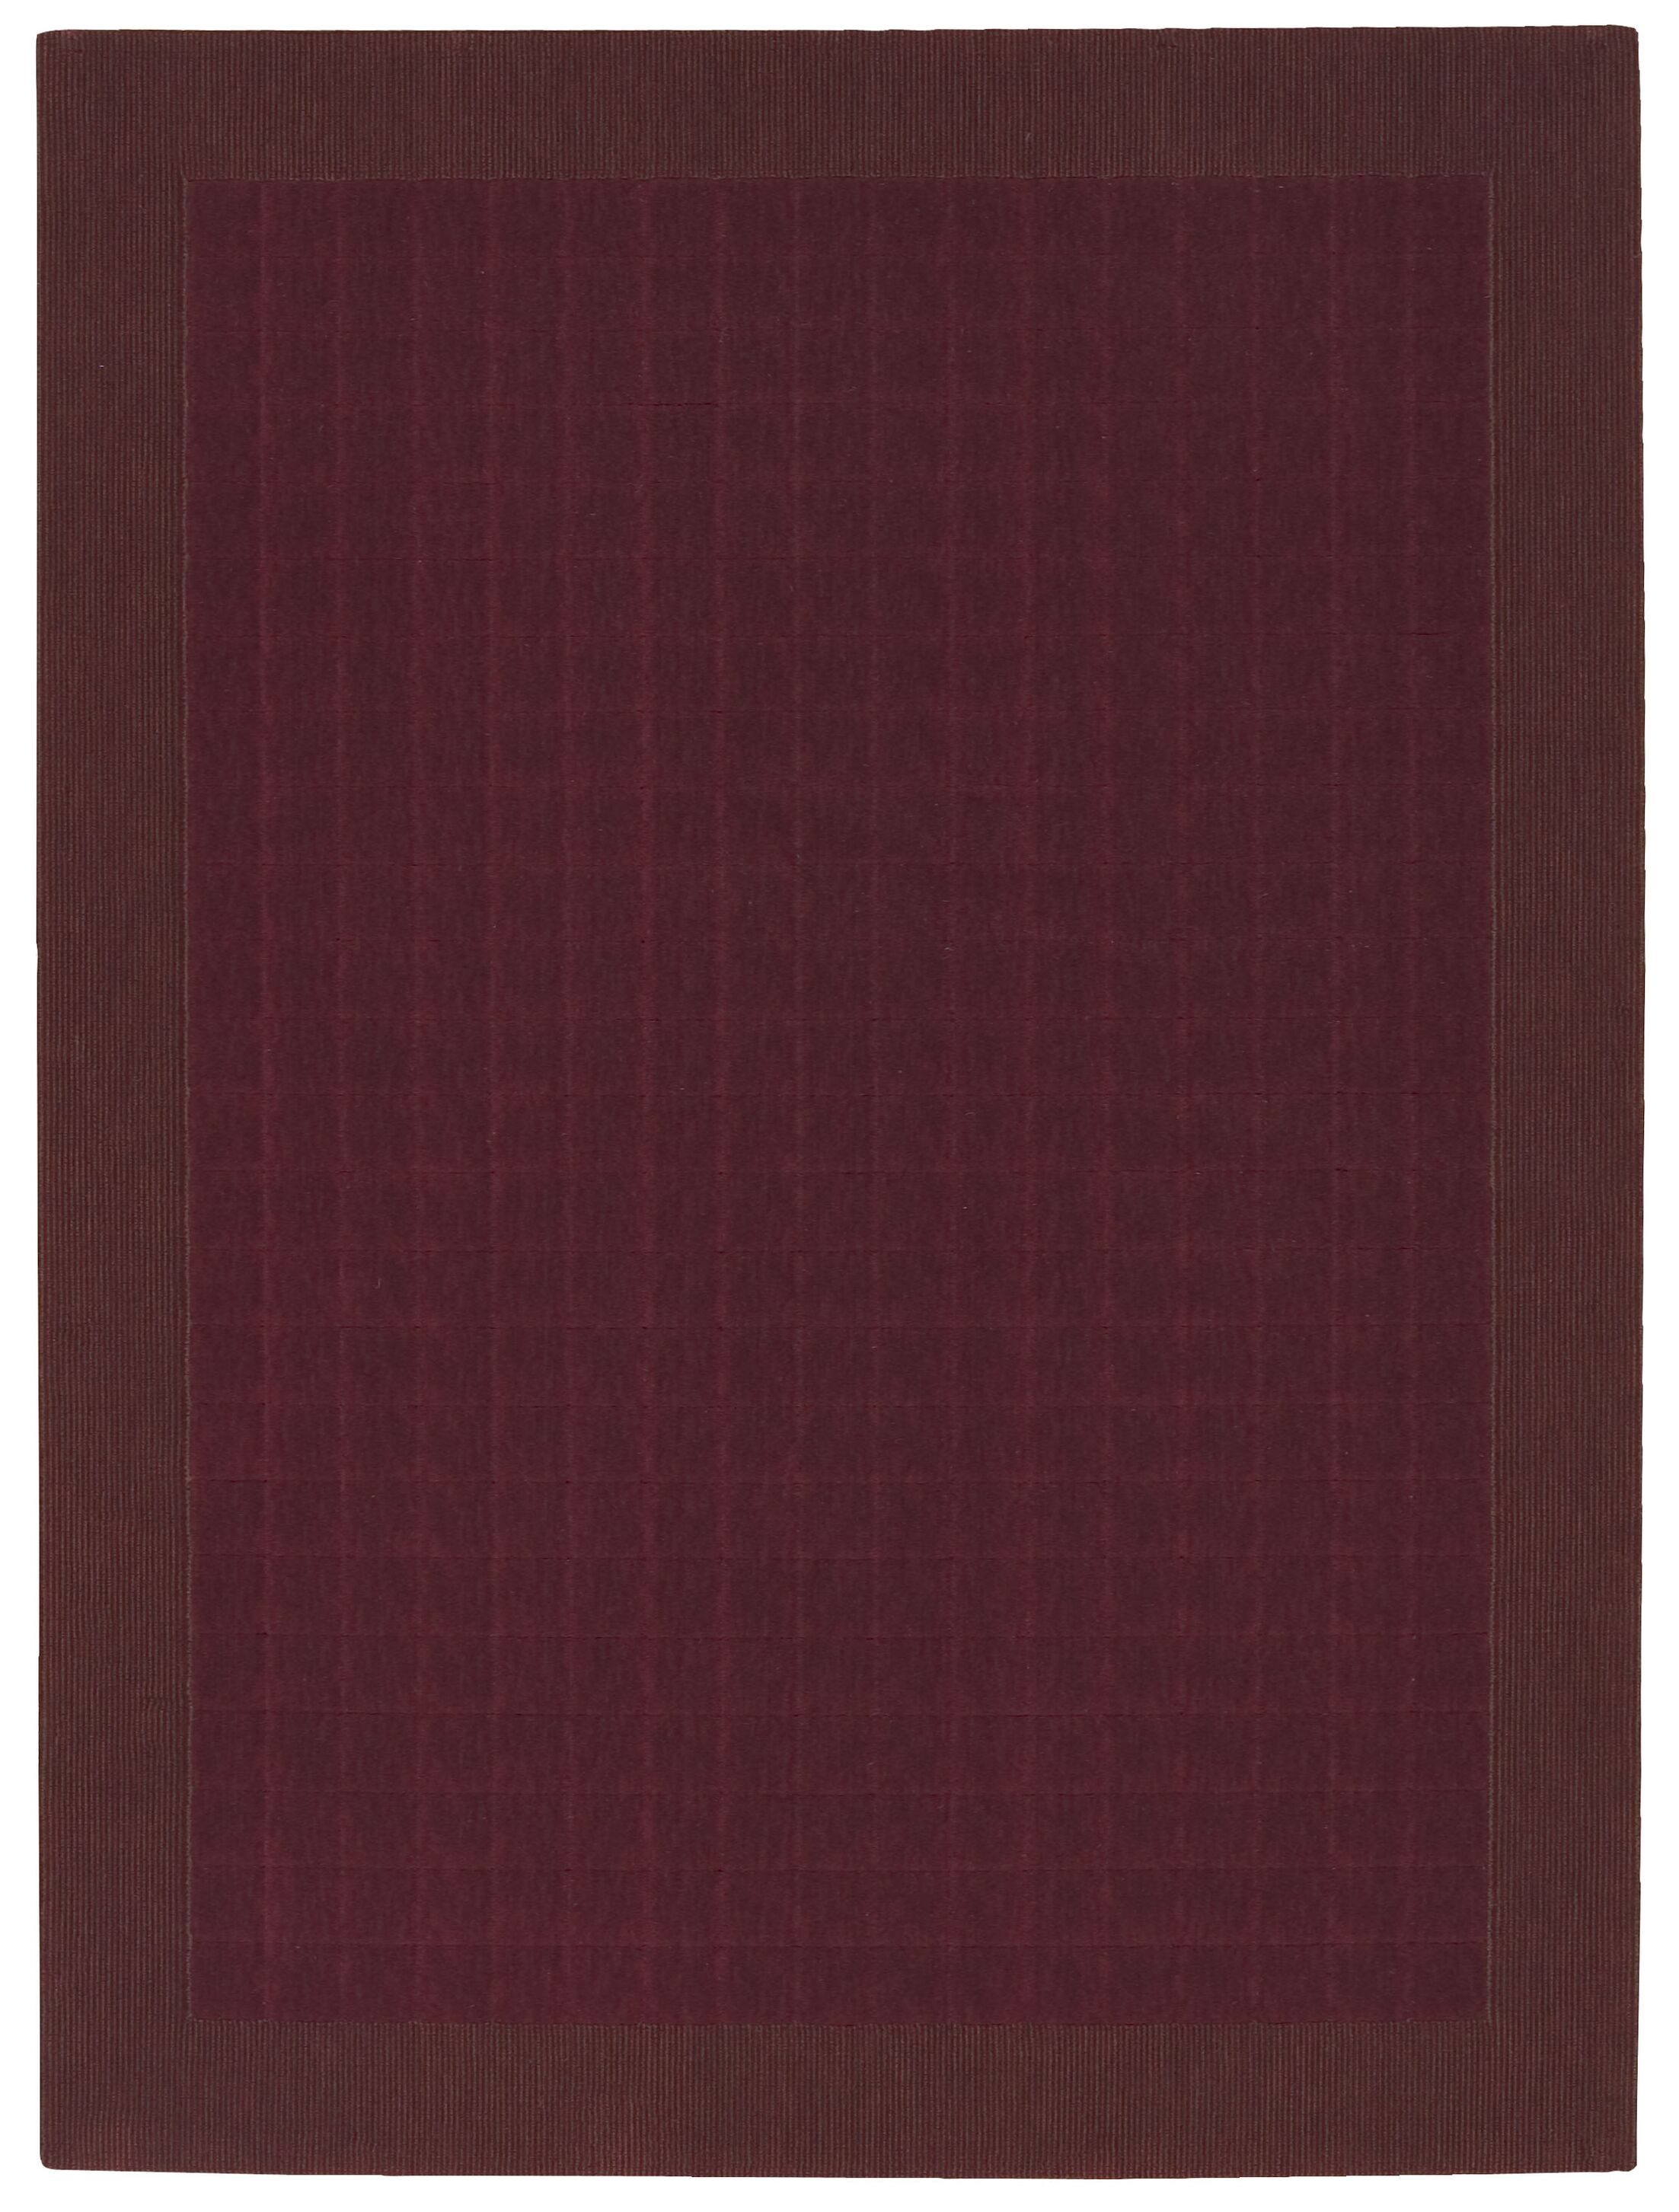 Loom Select Sienna Area Rug Rug Size: Rectangle 2' x 2'9